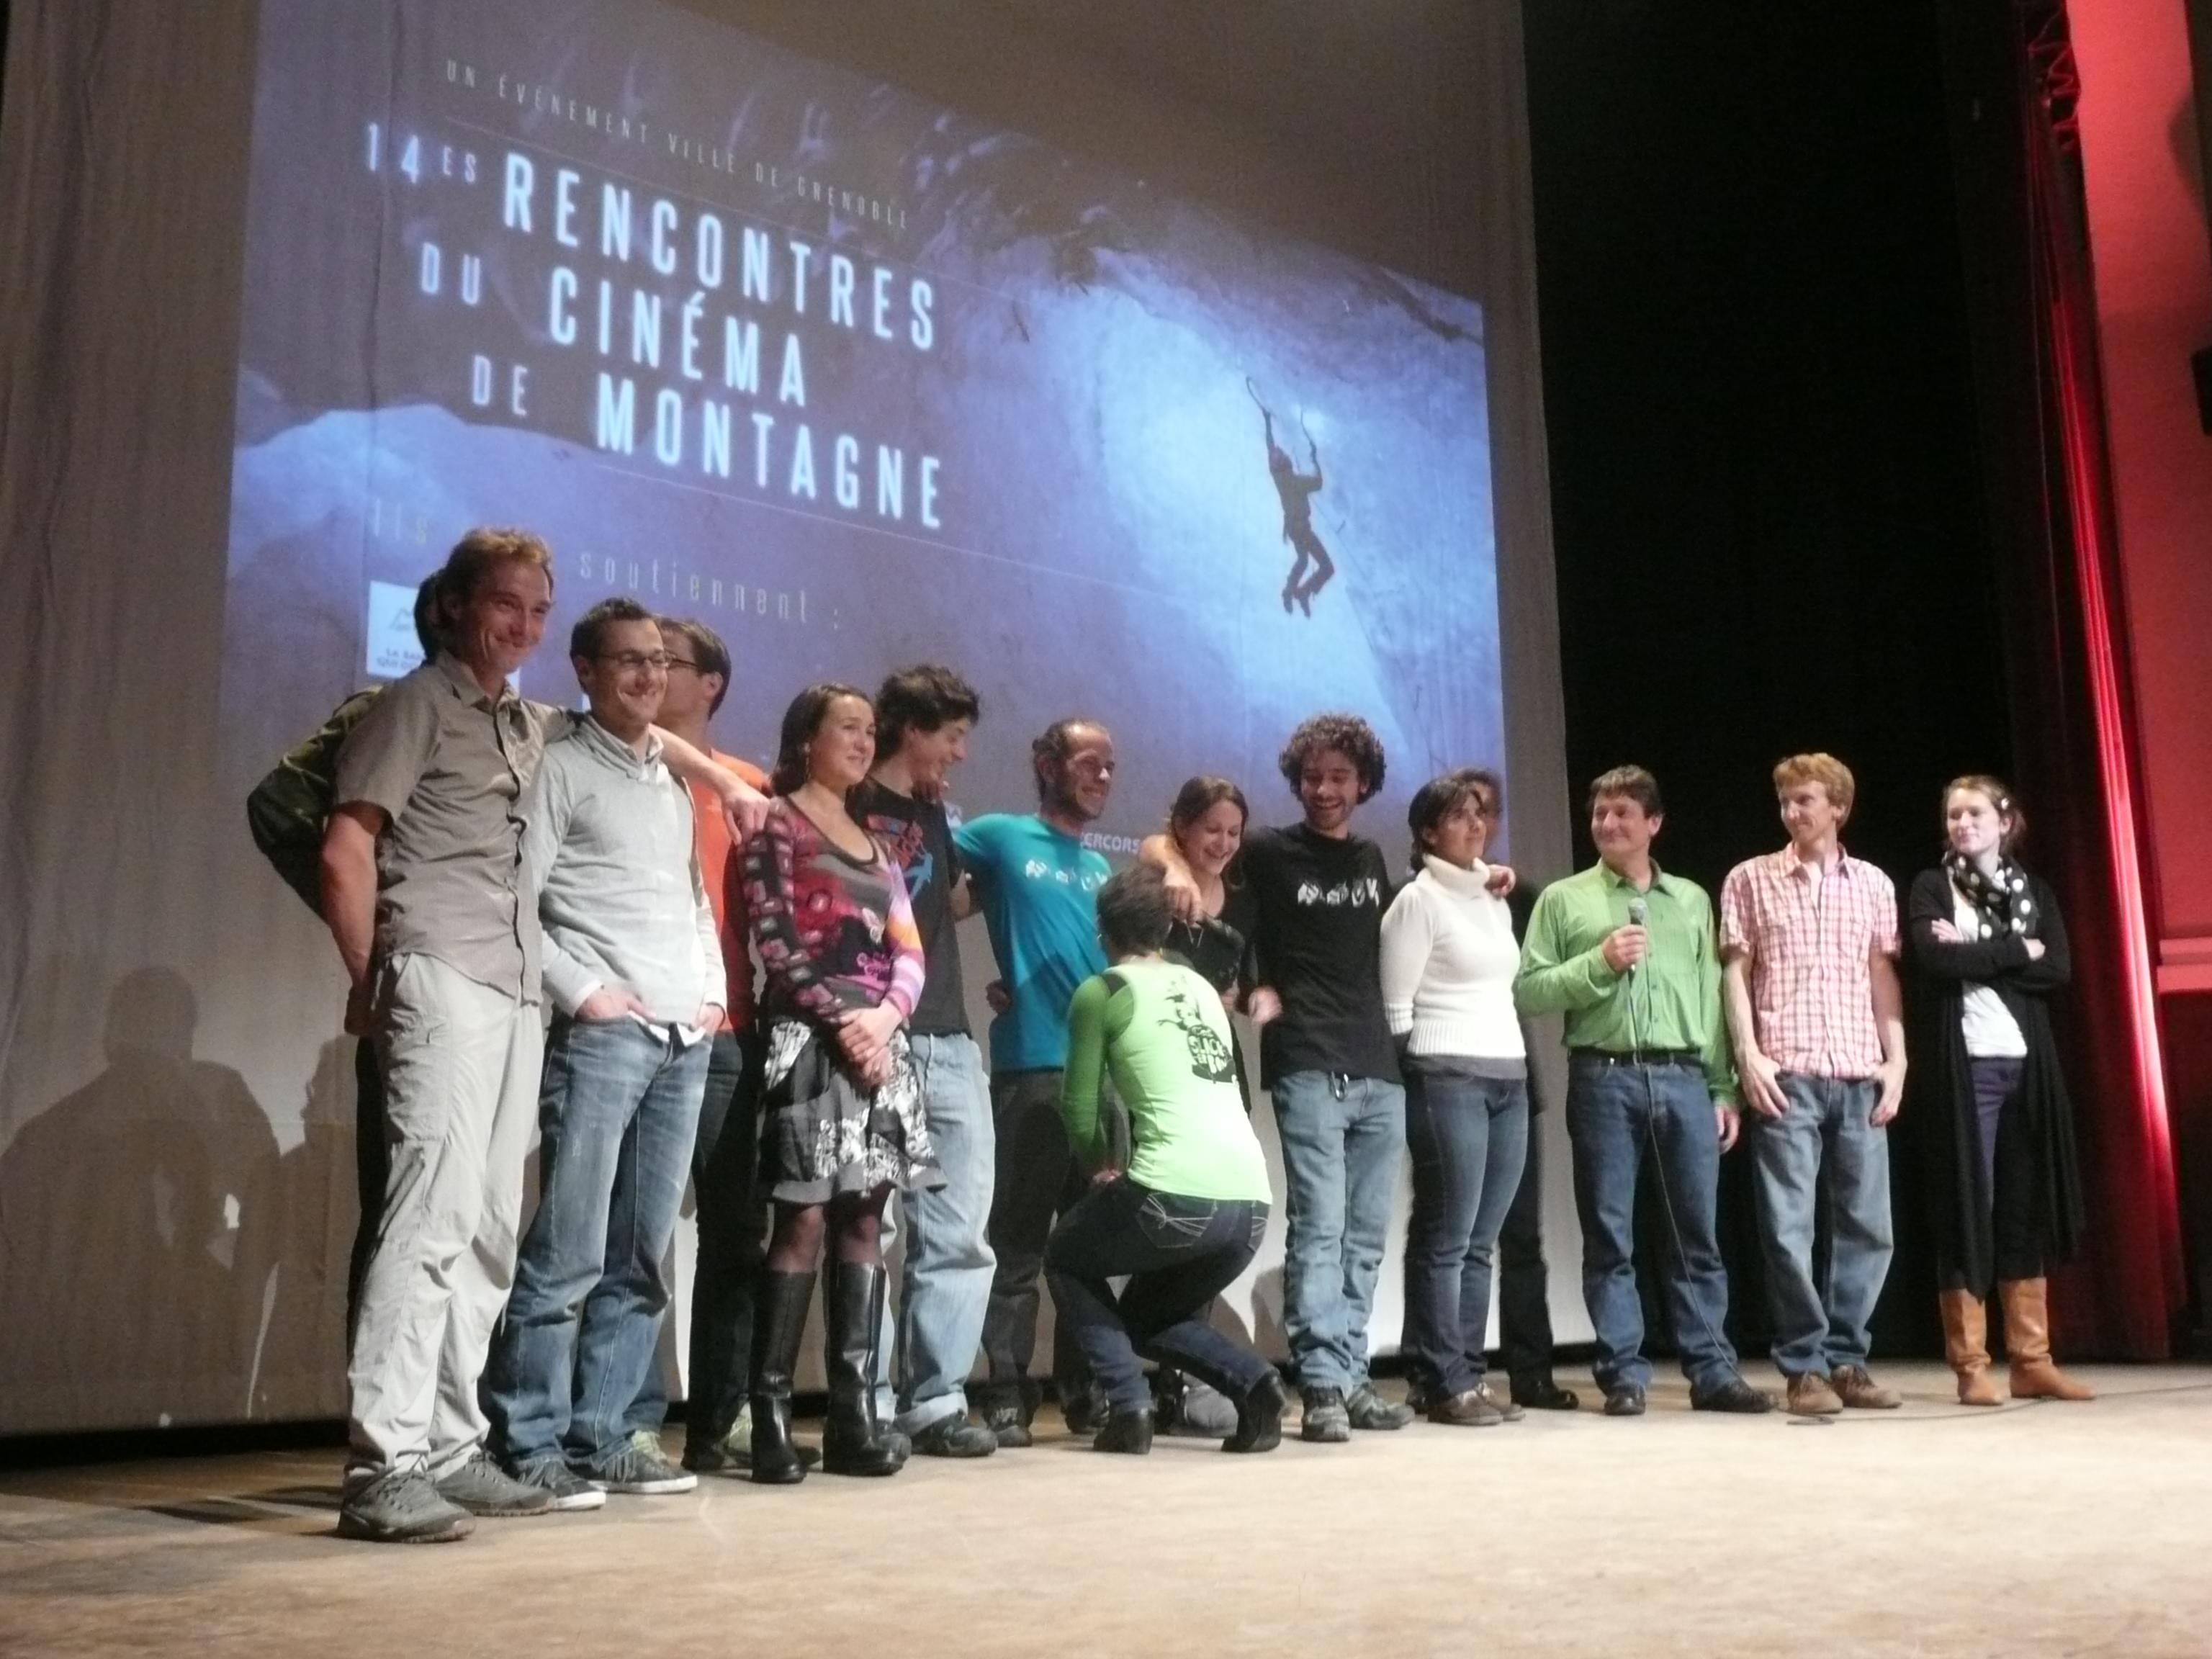 14es rencontres du cinema de montagne